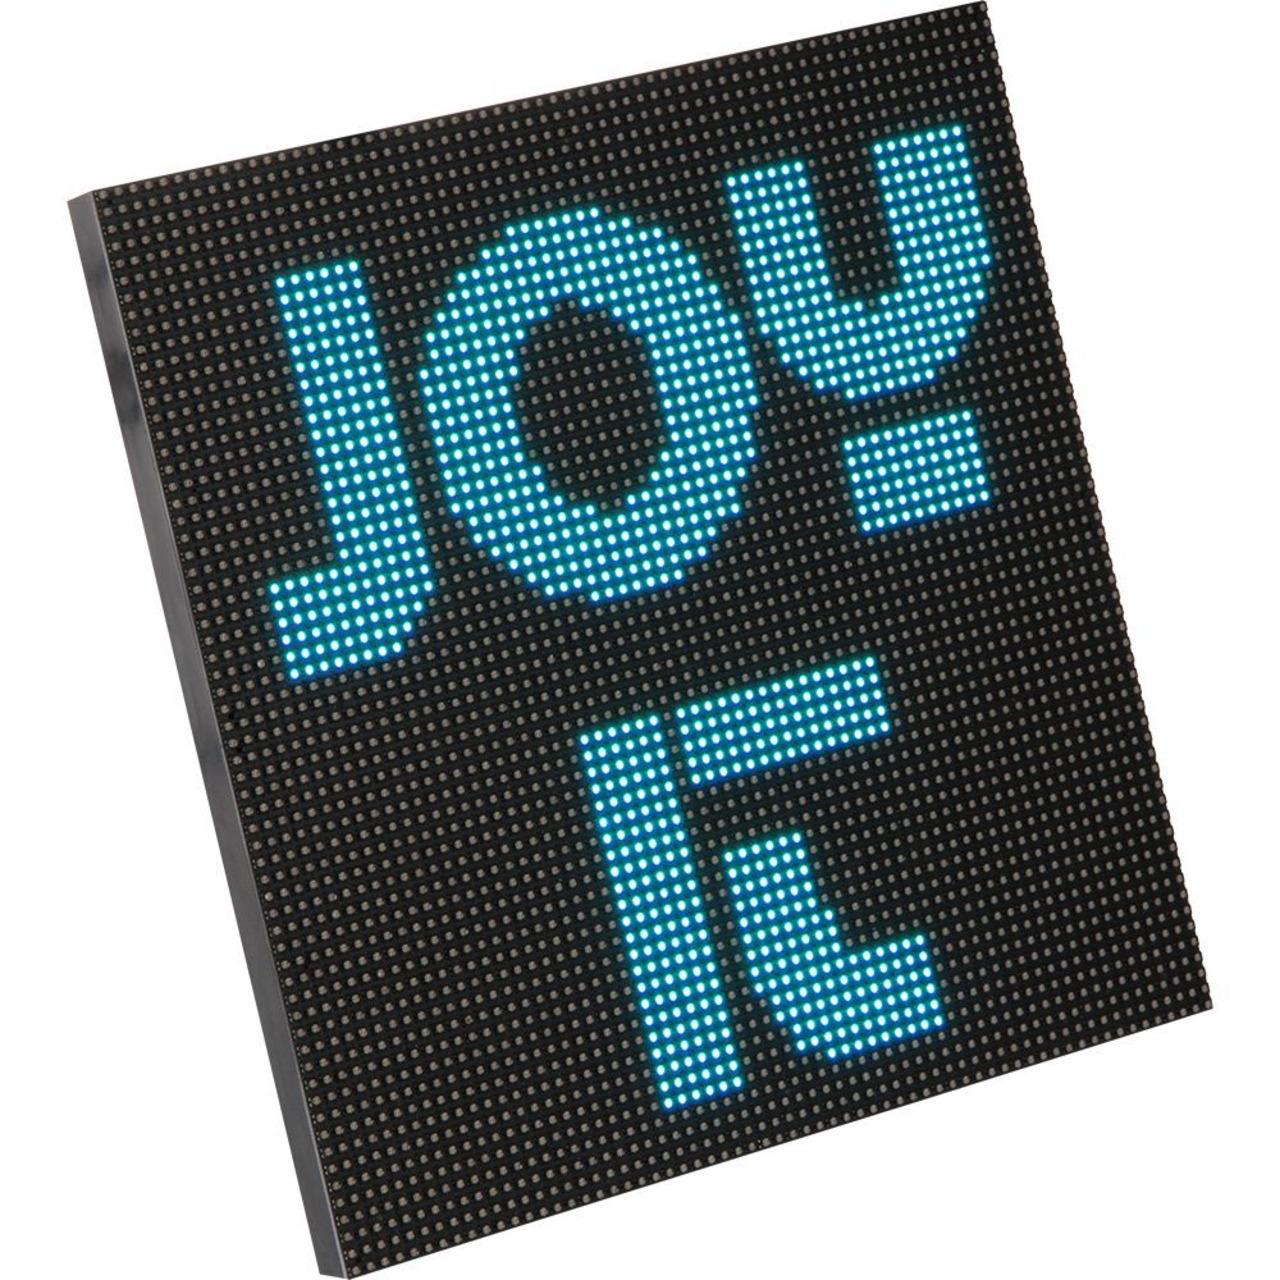 Joy-IT RGB-LED-Matrix-Modul 64x64 für Raspberry Pi- Arduino- Banana Pi- mirco:bit